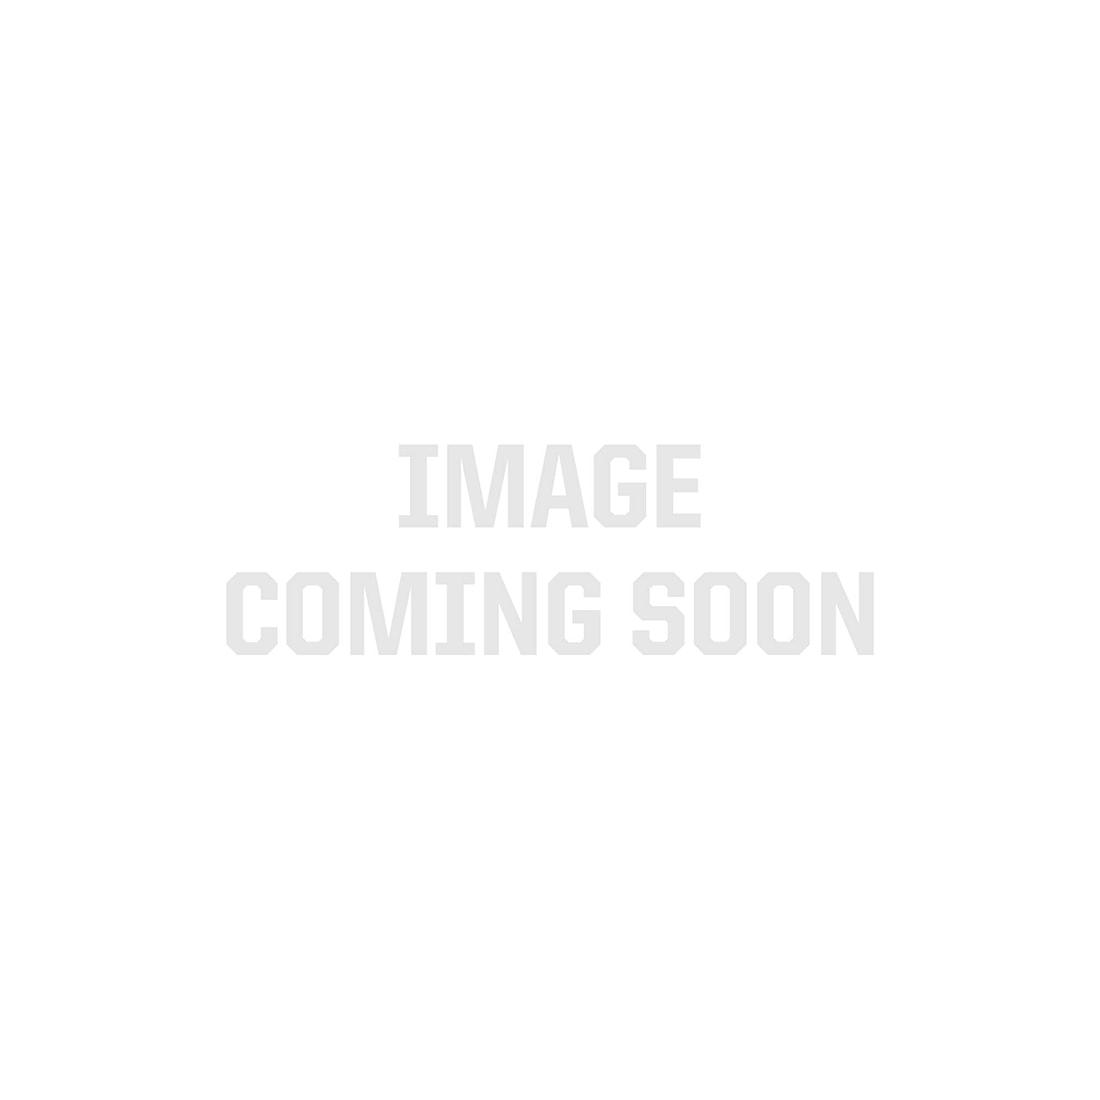 EL S07 Standard Aluminum Channel (Anodized)